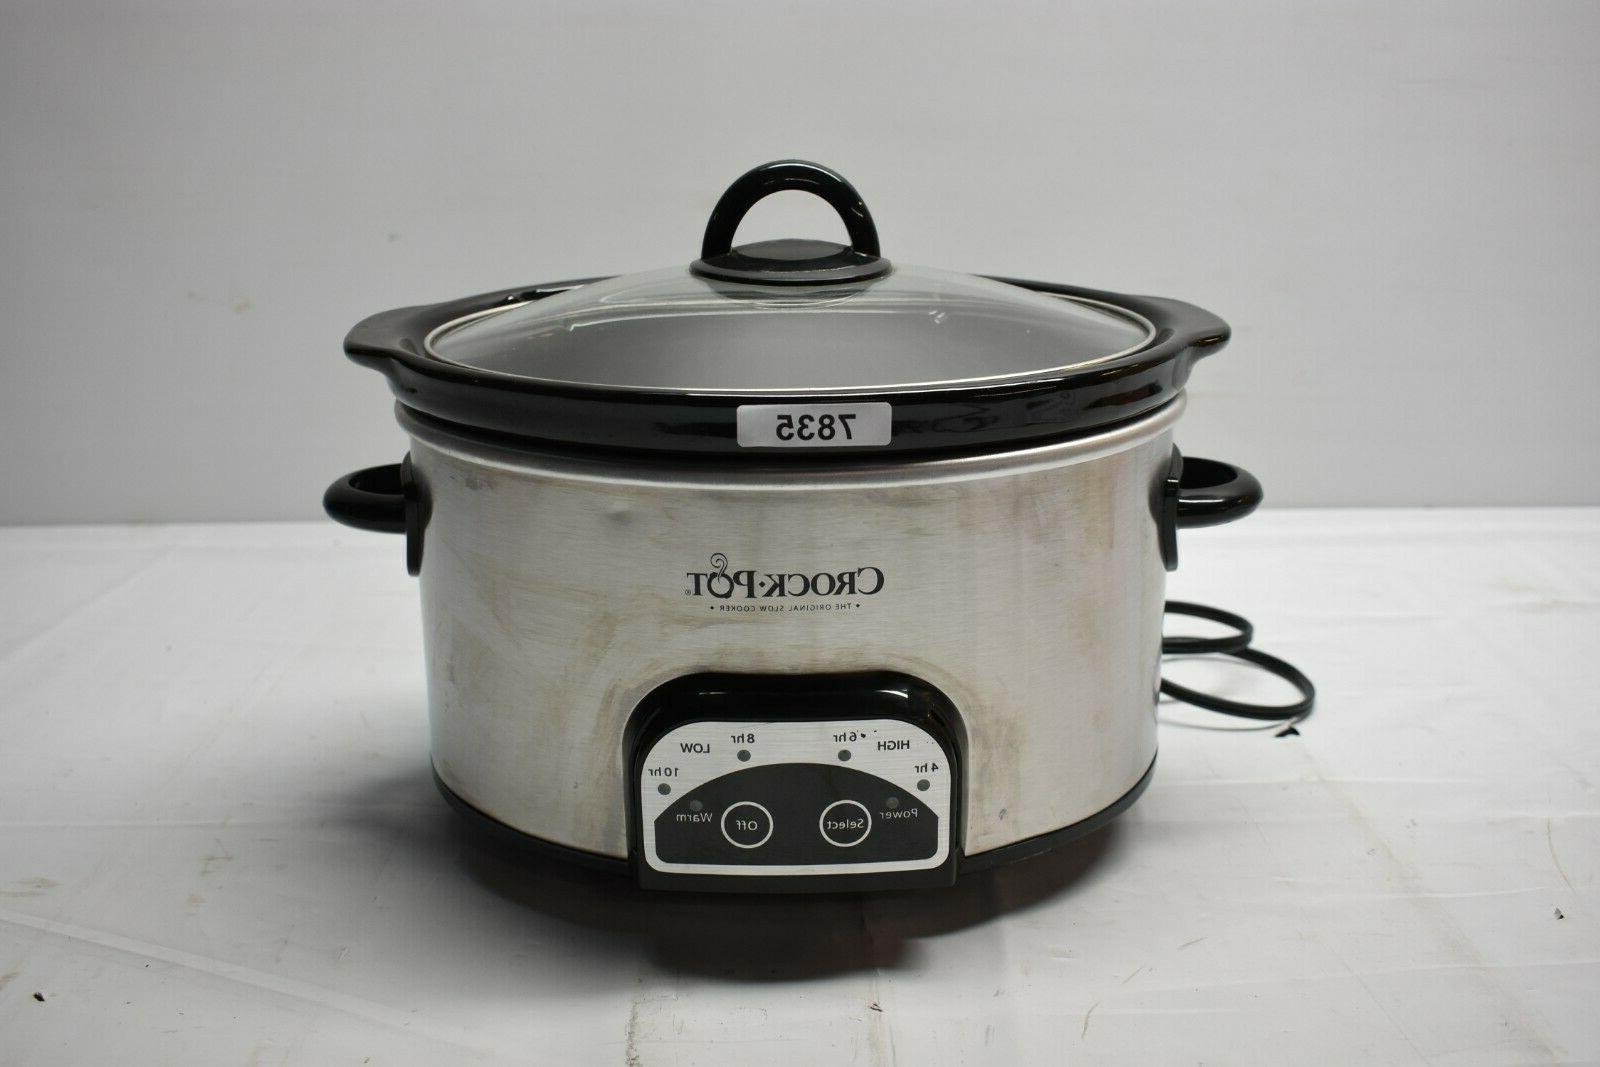 sccpvp400 smart pot slow cooker